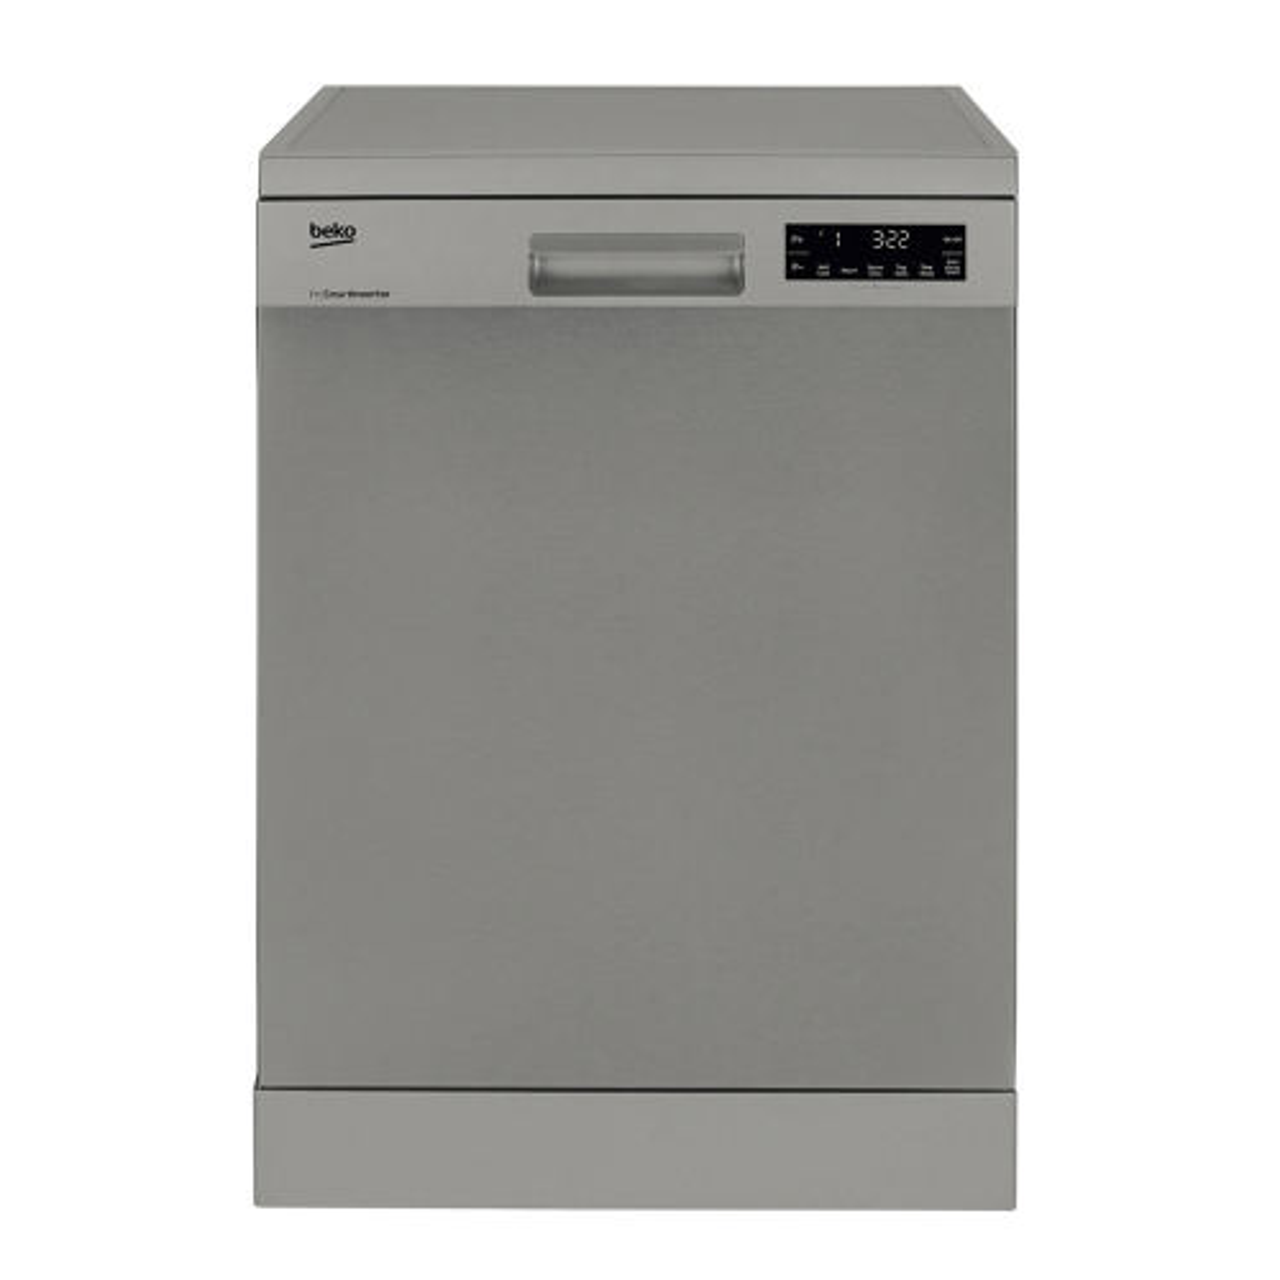 ماشین ظرفشویی بکو مدل DFN28320